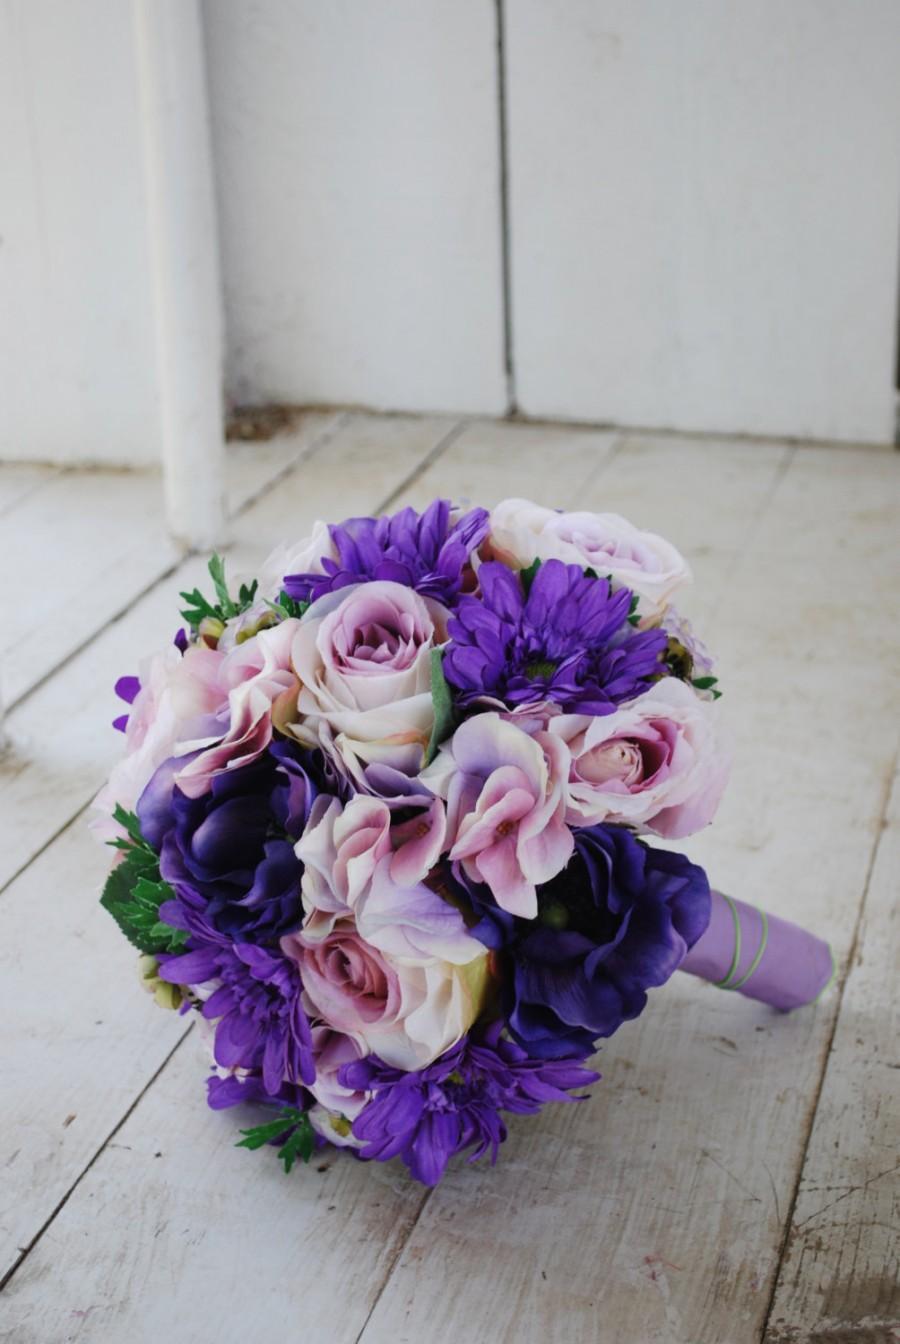 Mariage - Silk bridal bouquet, purple roses, gerbera daisies, lavender hydrangeas